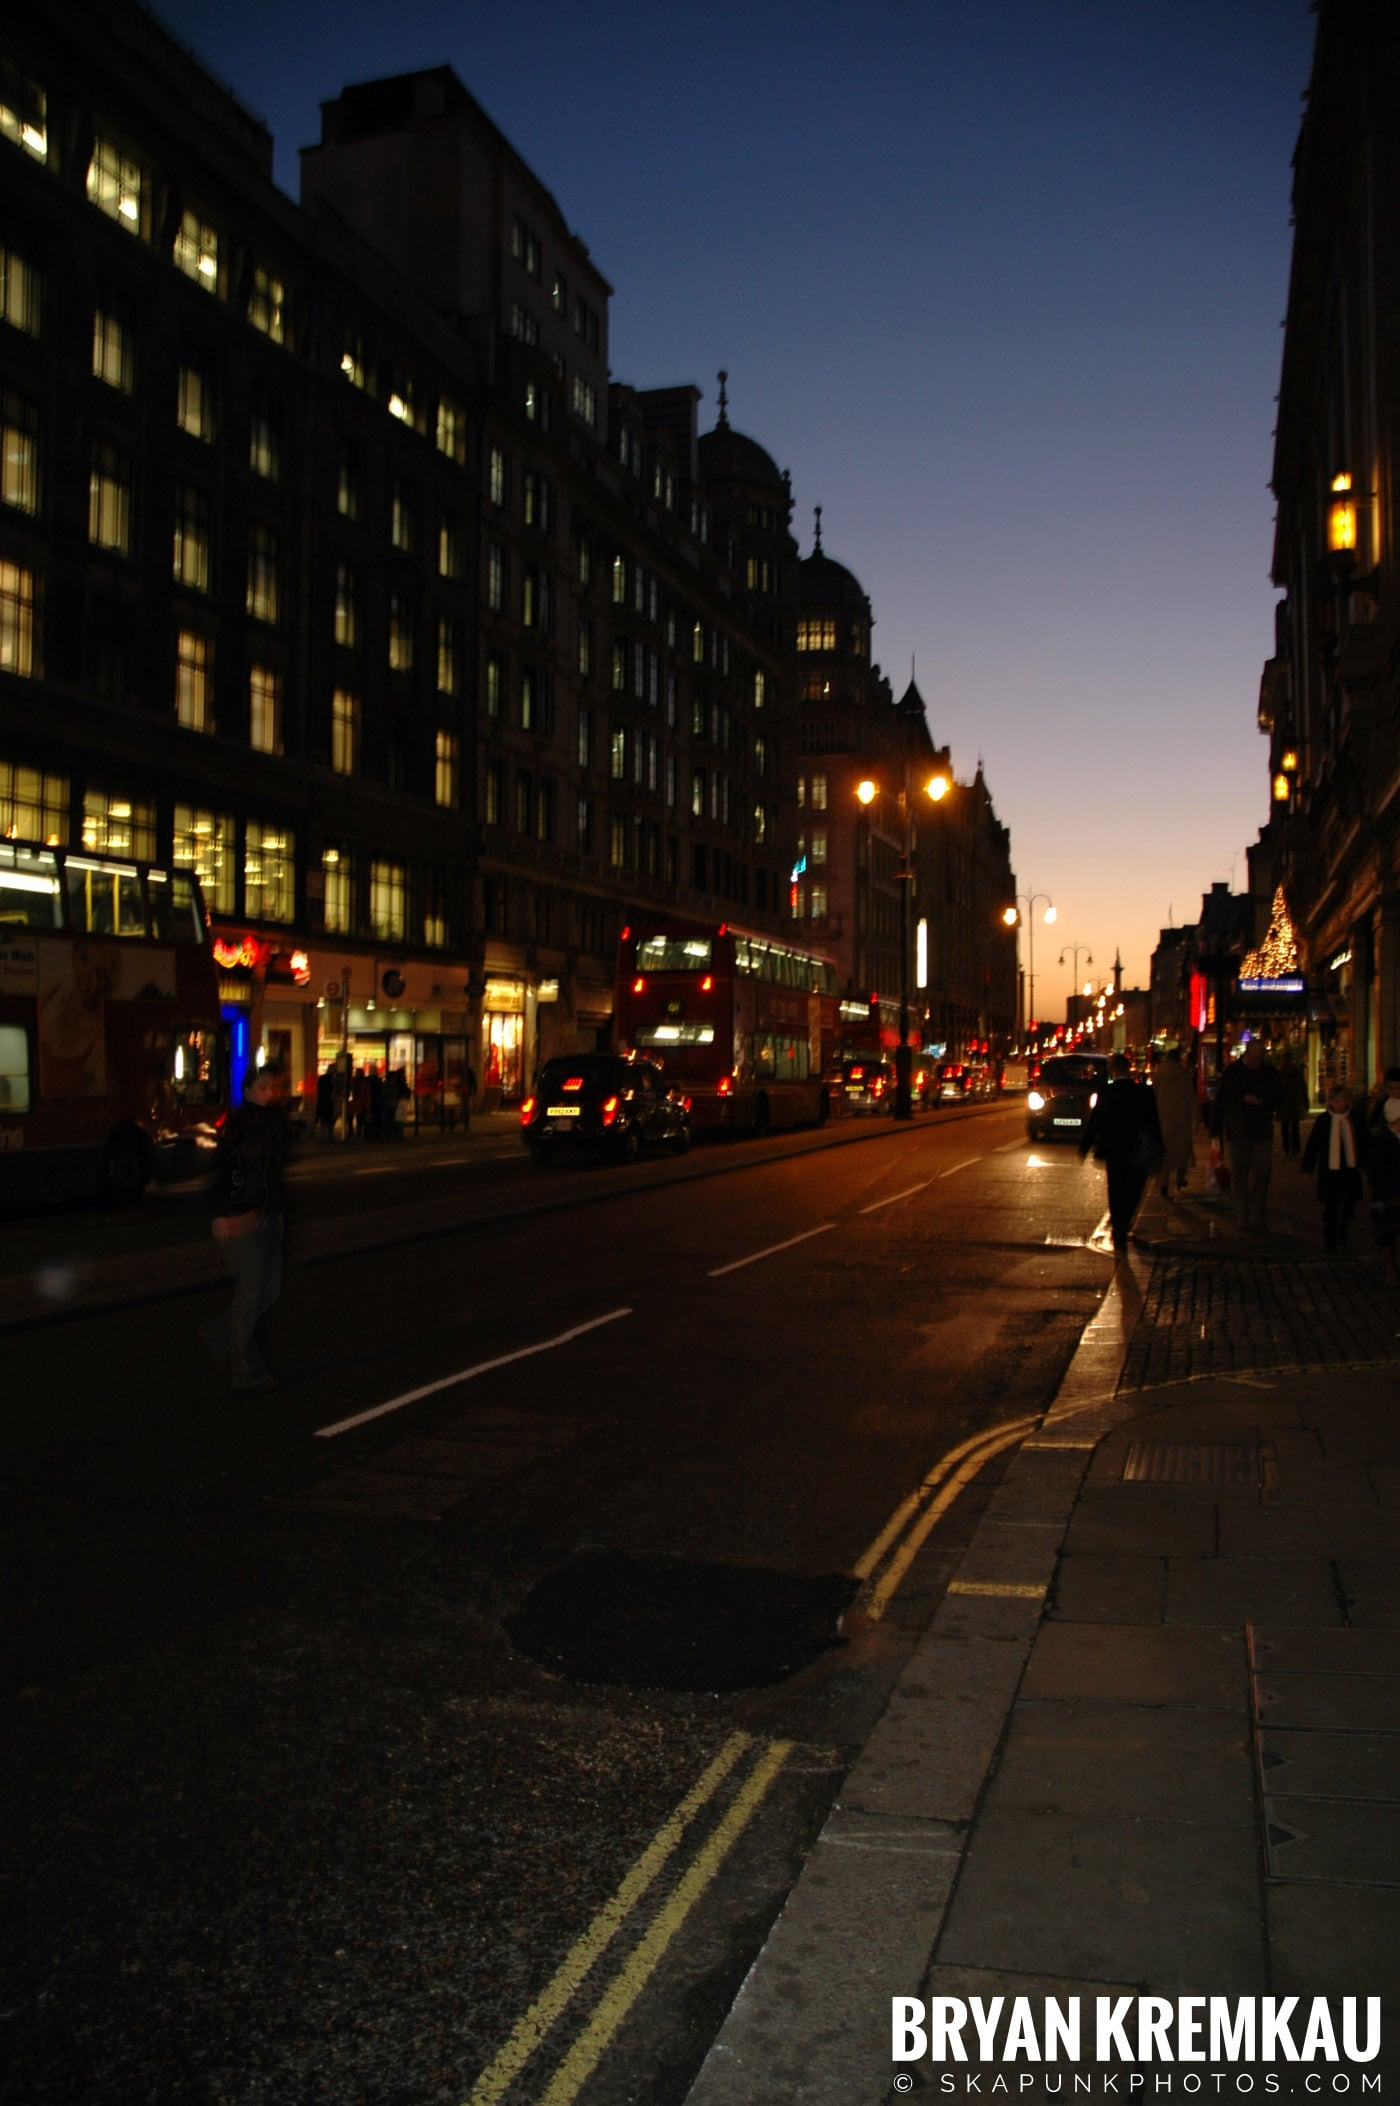 London, England - Day 4 - 12.19.05 (3)